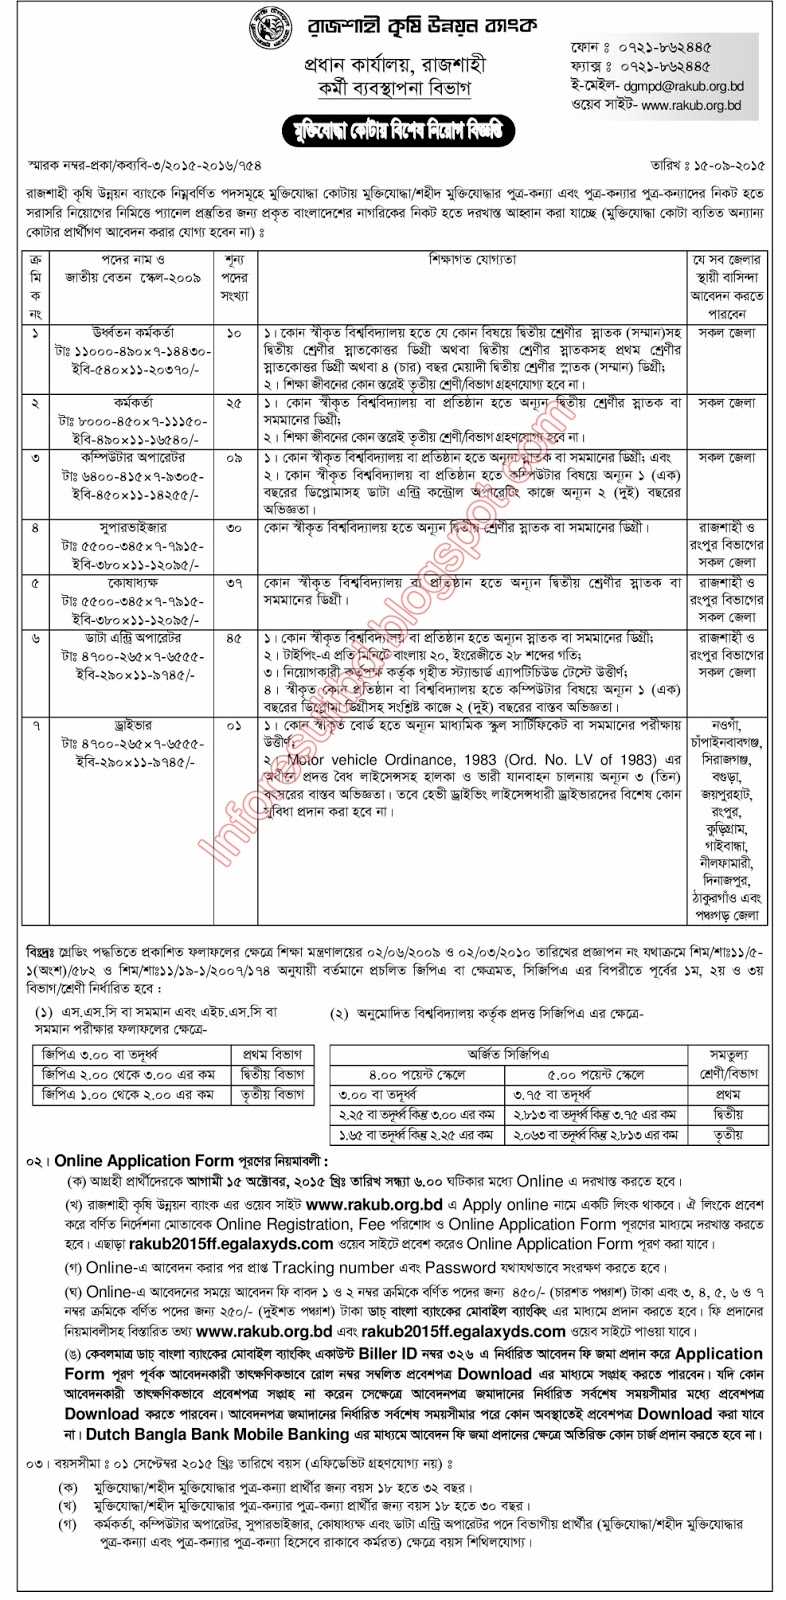 Rajshahi Krishi Unnayan Bank (Only For FF Quota) Job Circular ...